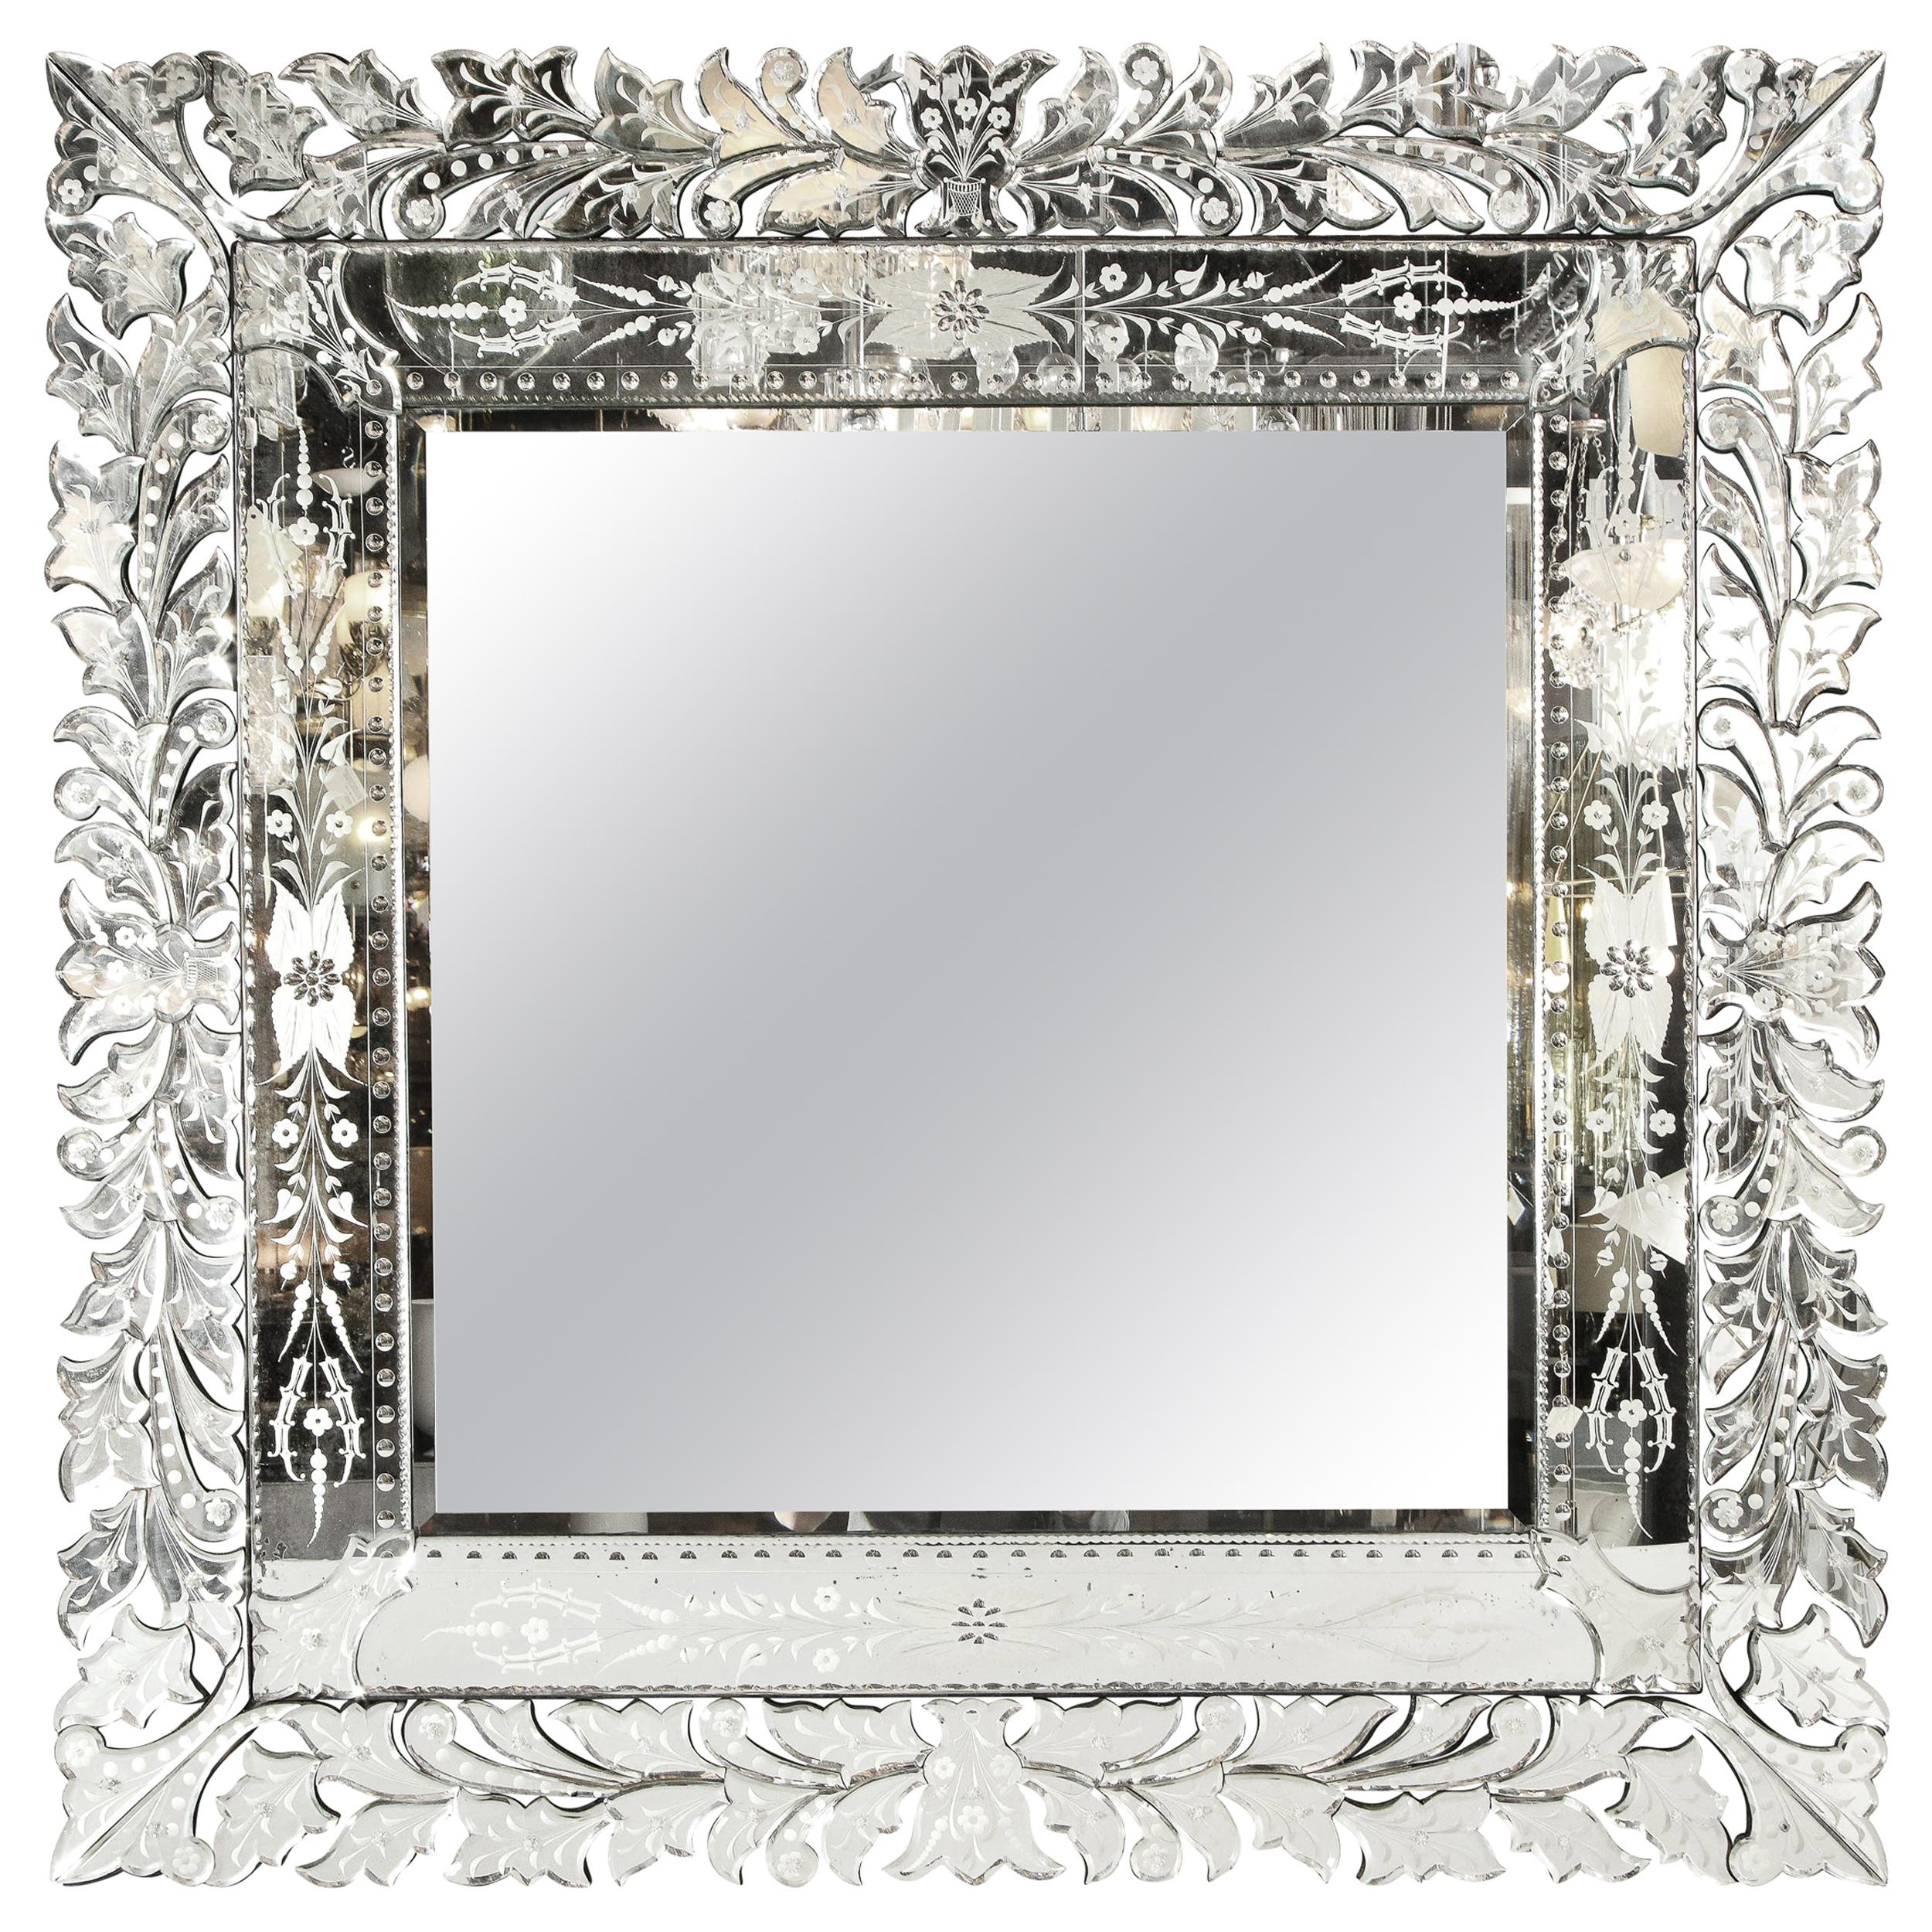 Art Deco Venetian Etched & Beveled Mirror w/ Stylized Floral Motifs